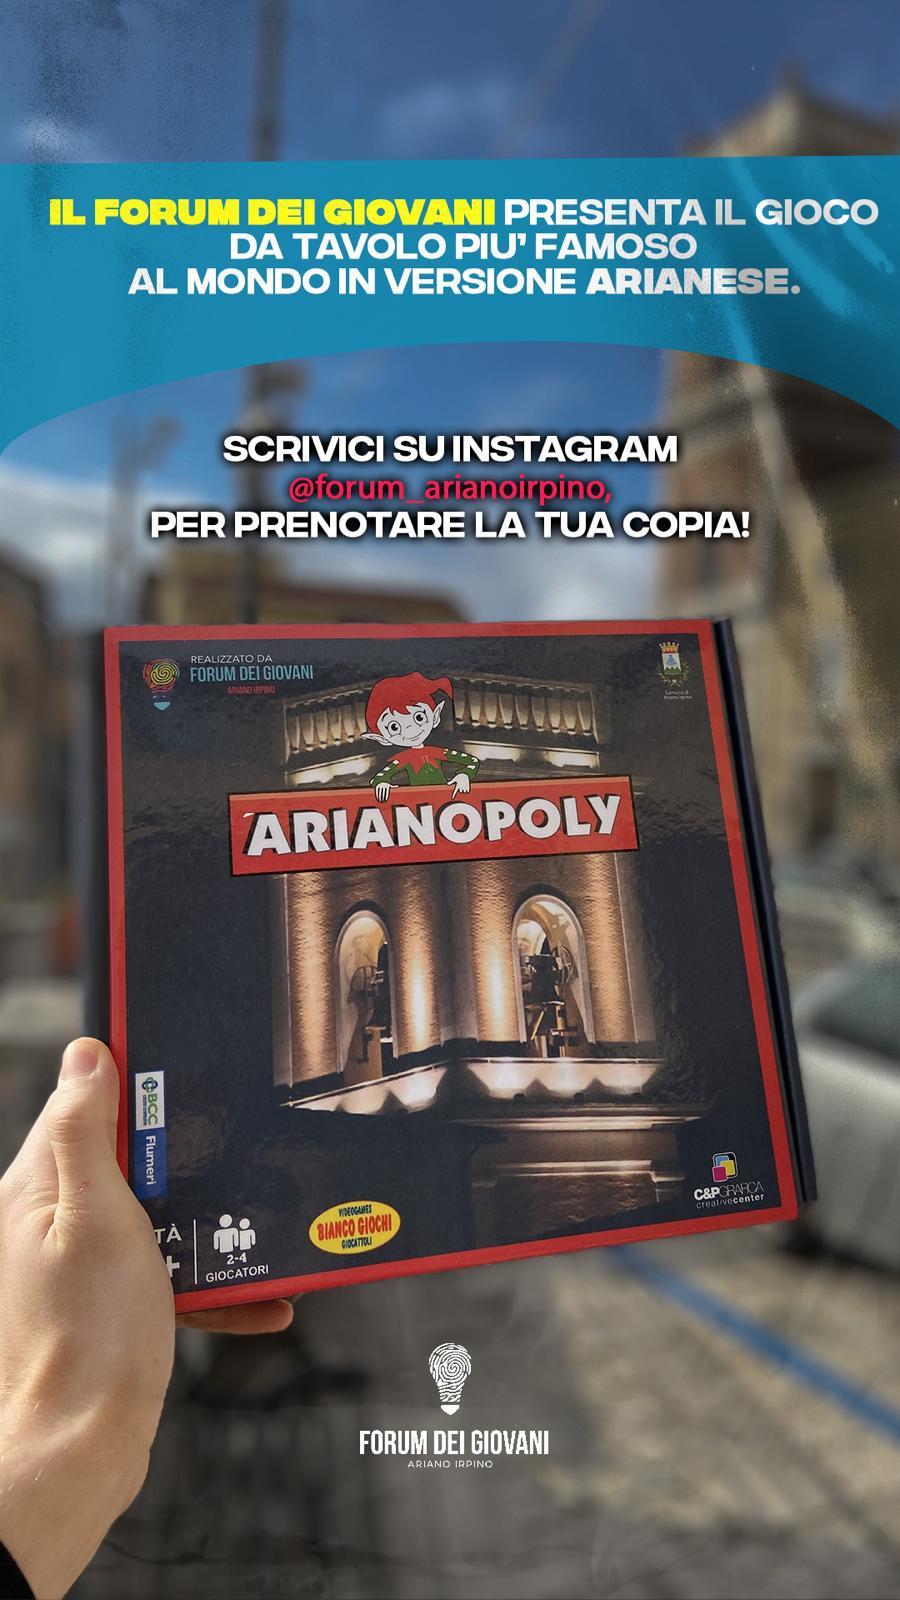 arianolpoli